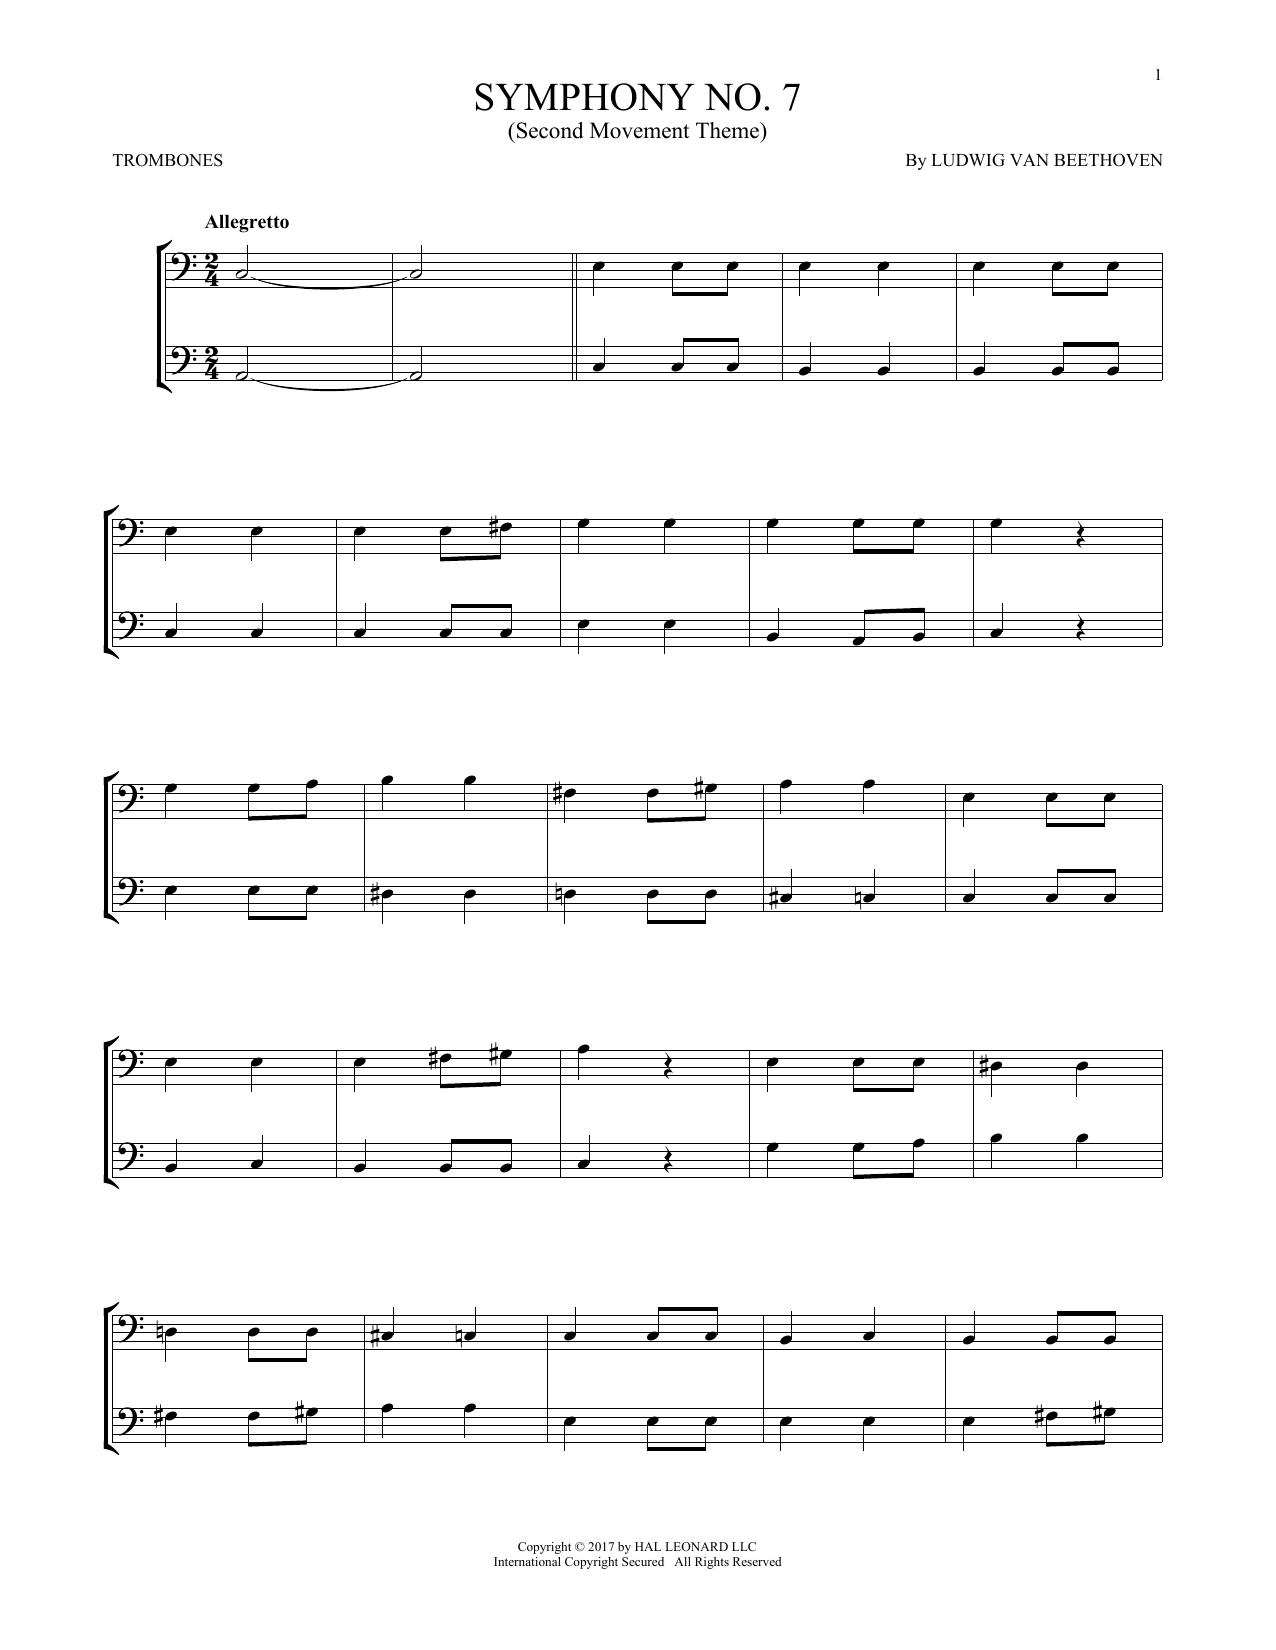 Symphony No. 7 In A Major, Second Movement (Allegretto) (Trombone Duet)